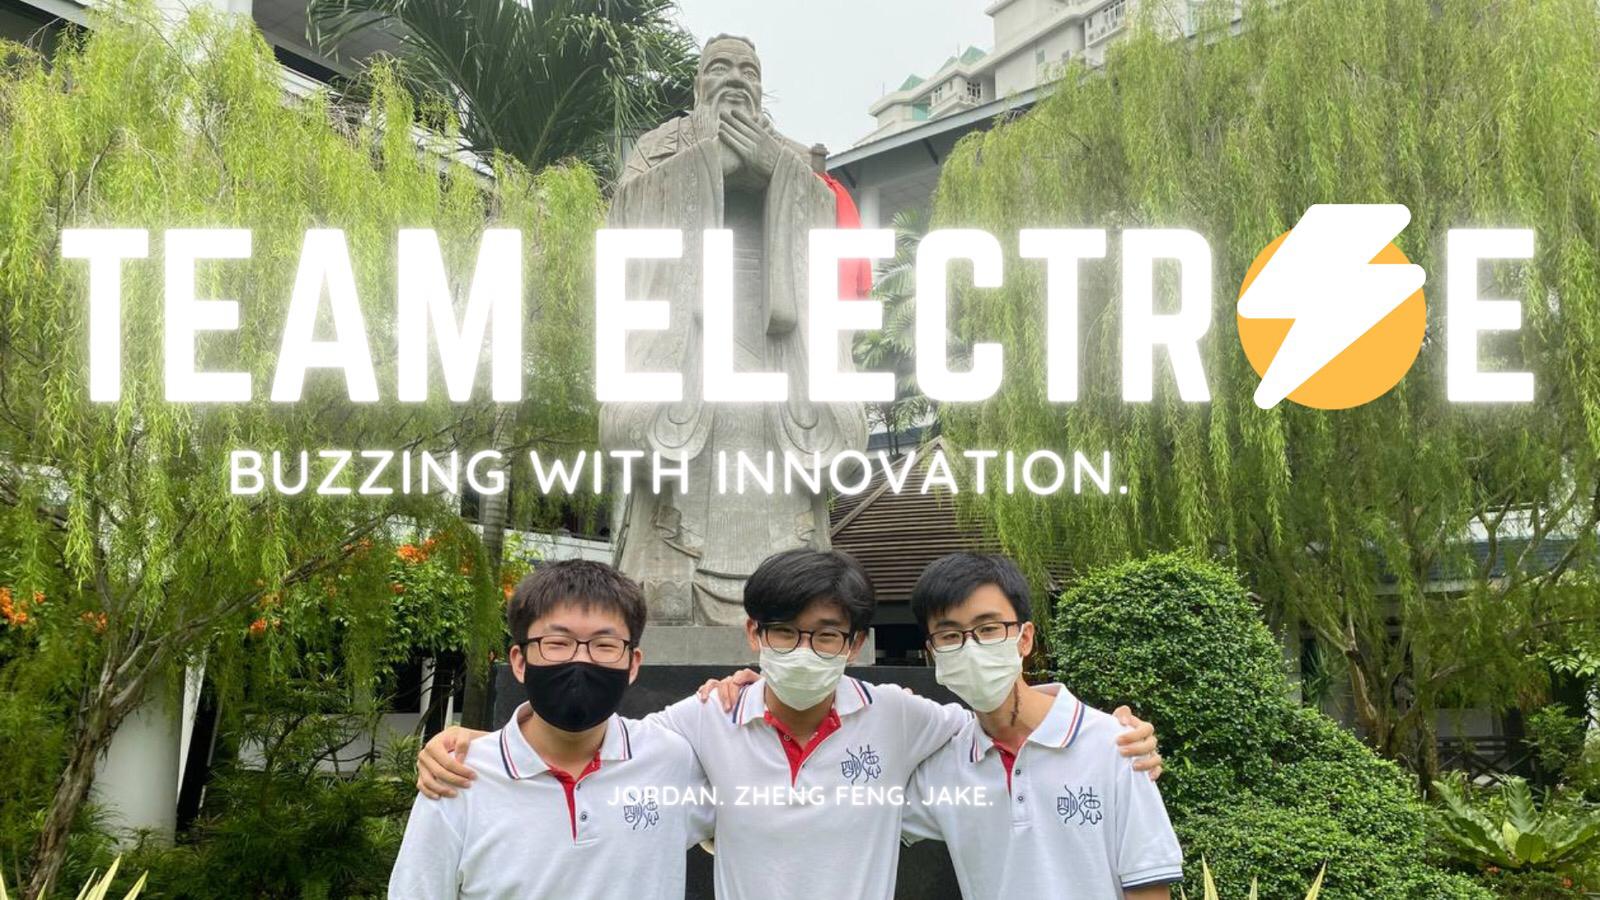 Photograph of Team Electrae members